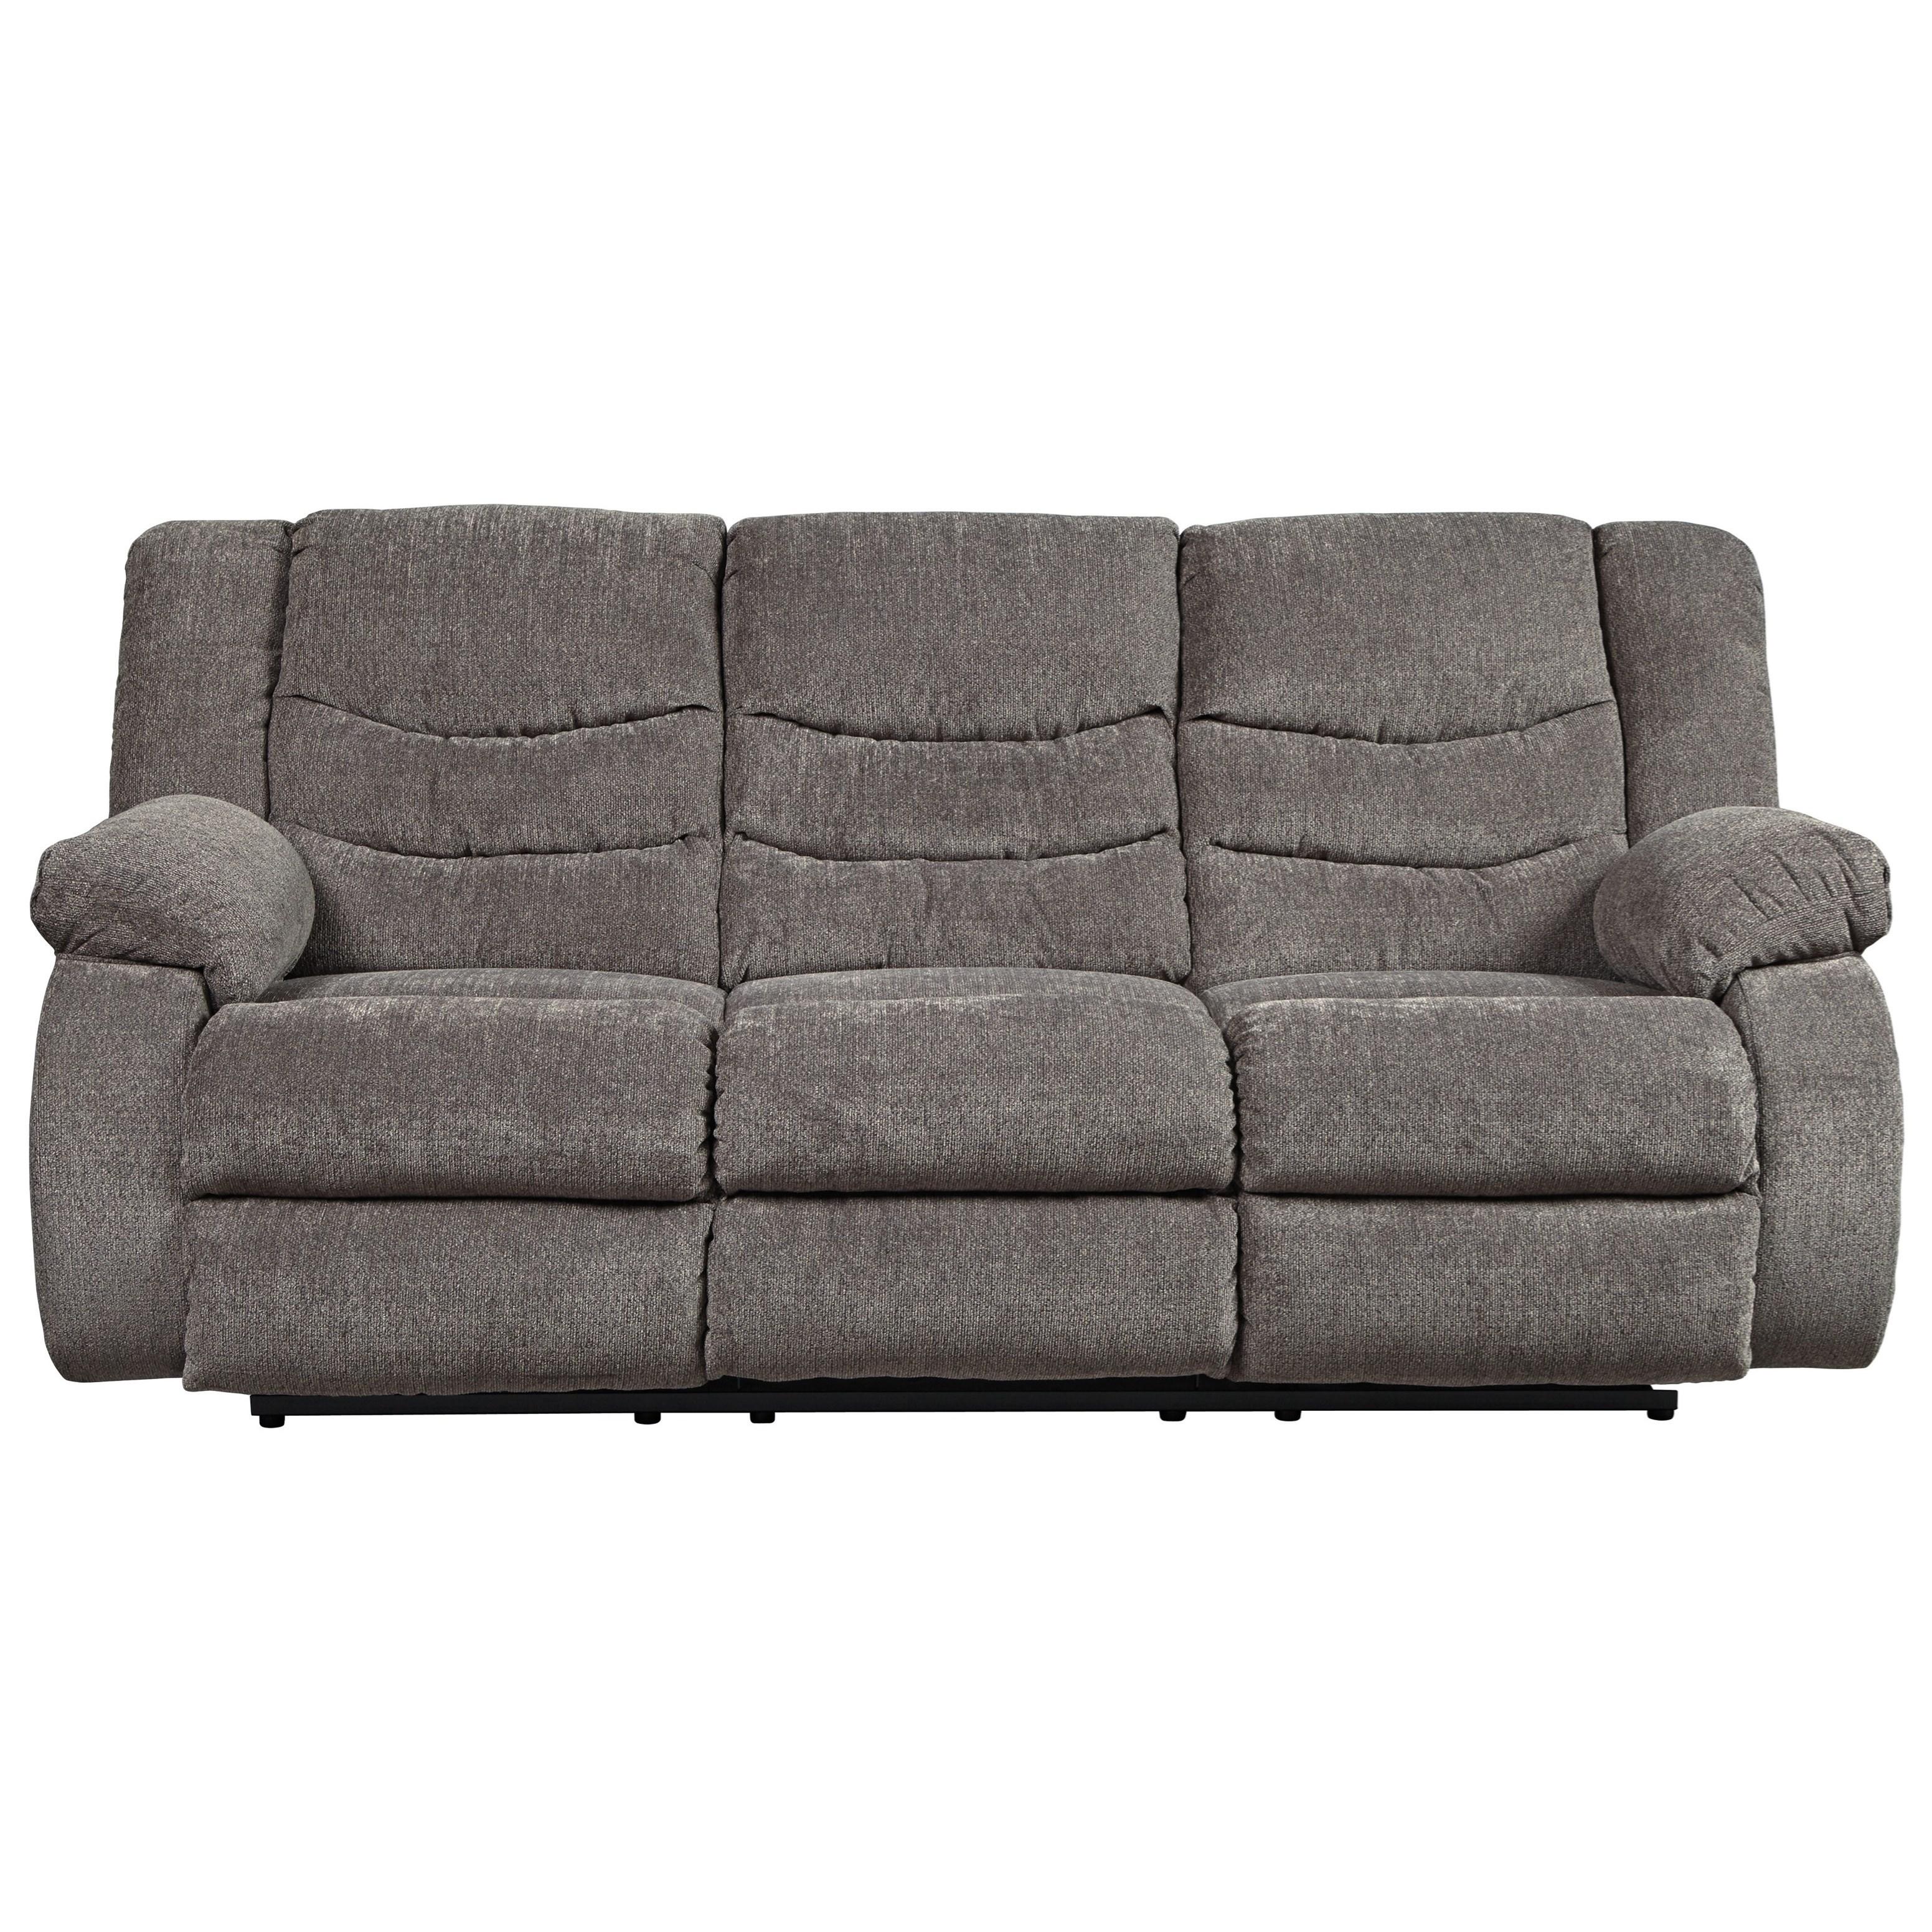 ashley sofa recliners crate and barrel camden dimensions signature design by tulen 9860688 contemporary